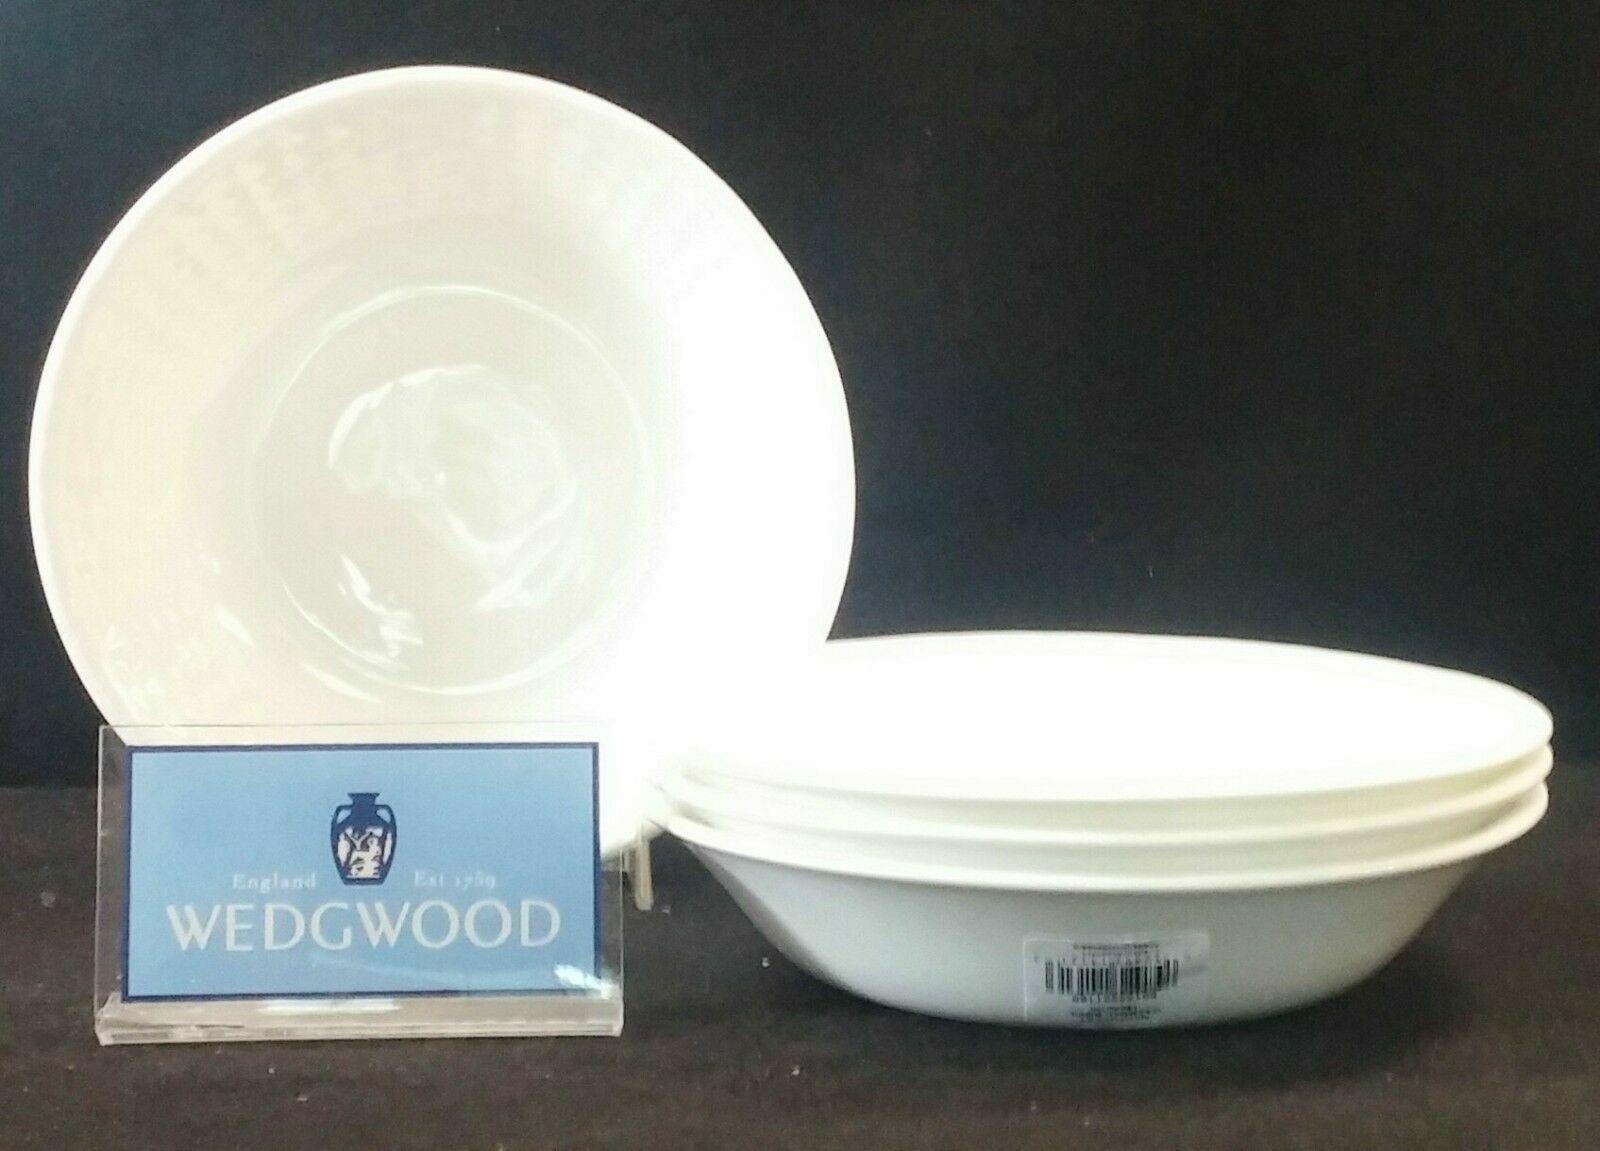 Set of 4 Wedgwood Nantucket Basket 8 Inch Stacking Bowls